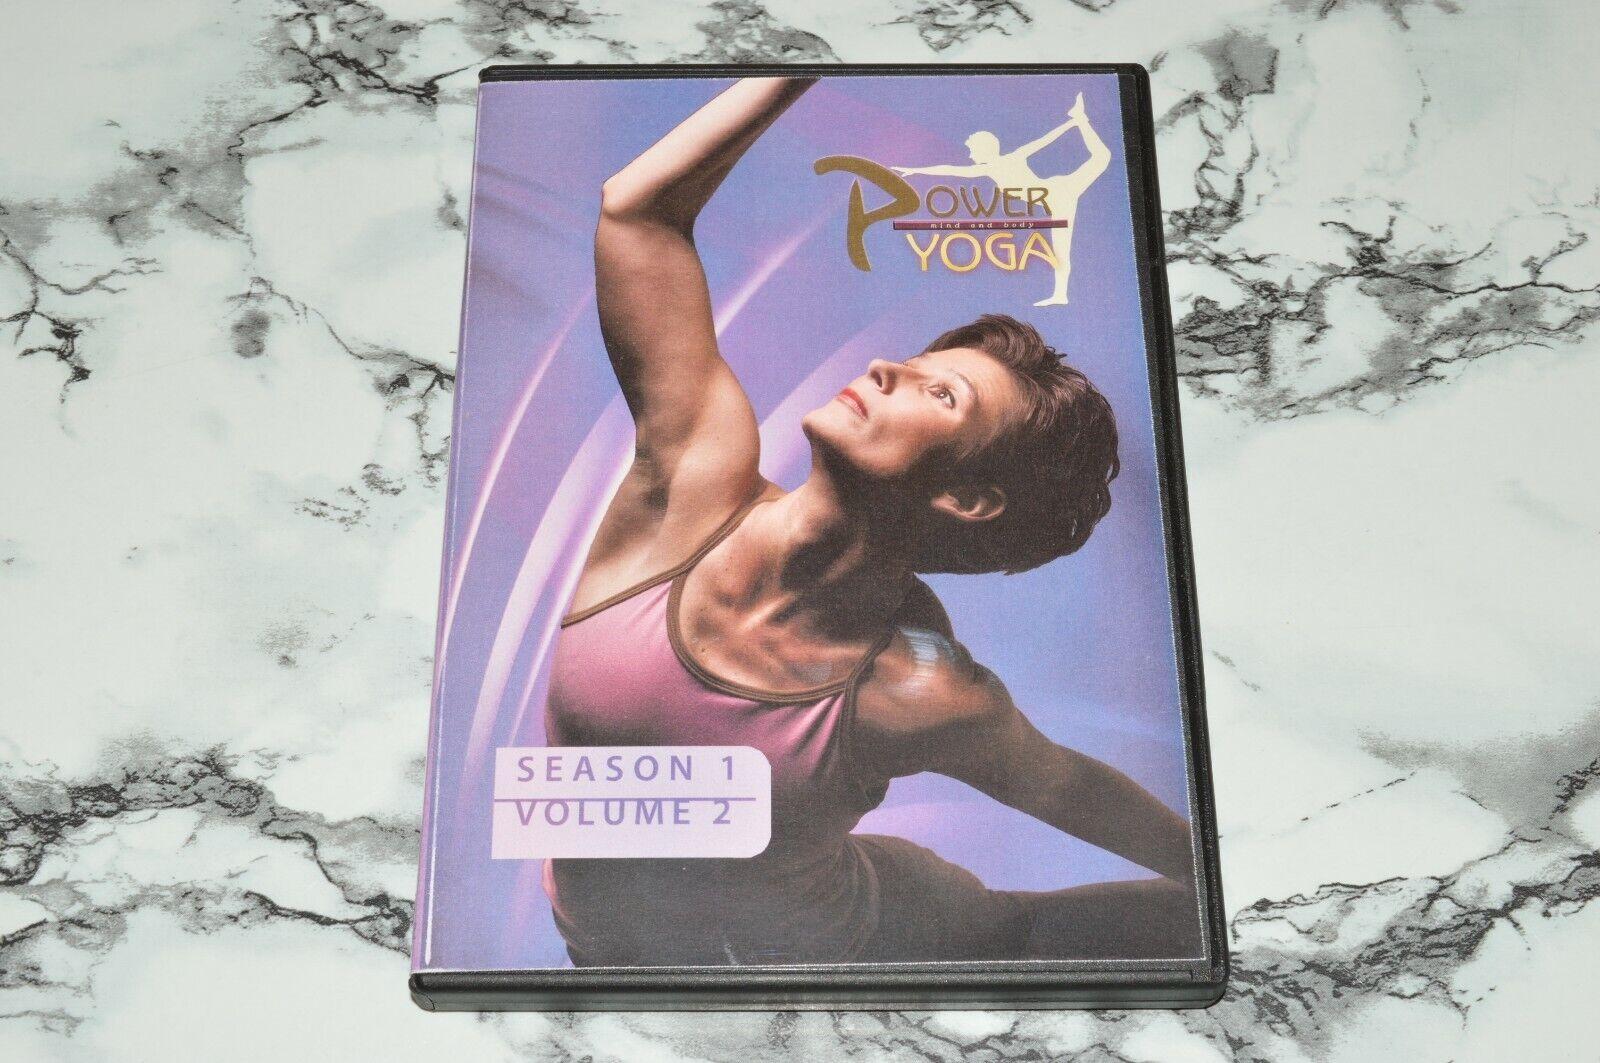 Power Yoga - Mind And Body - Season 1 One Volume 2 Two -- DVD  - $12.68